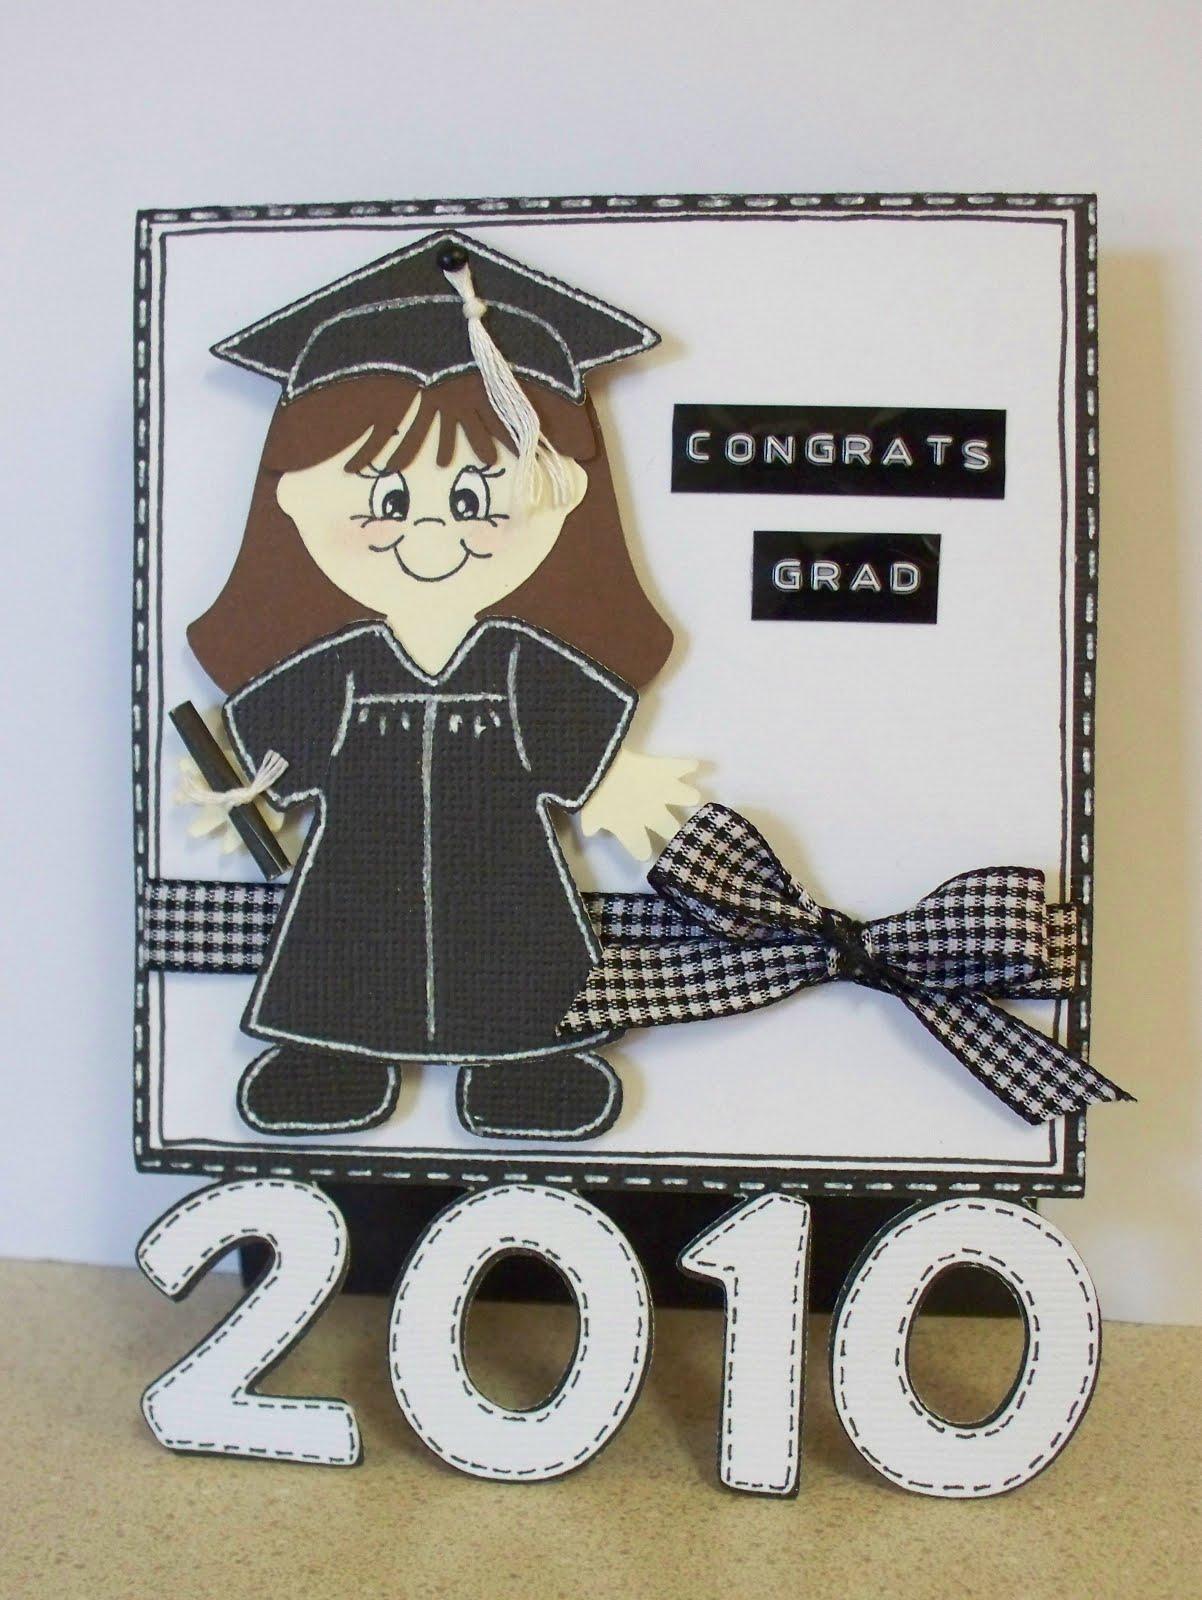 Scrappin Navy Wife Congrats Grad 2010 Cards